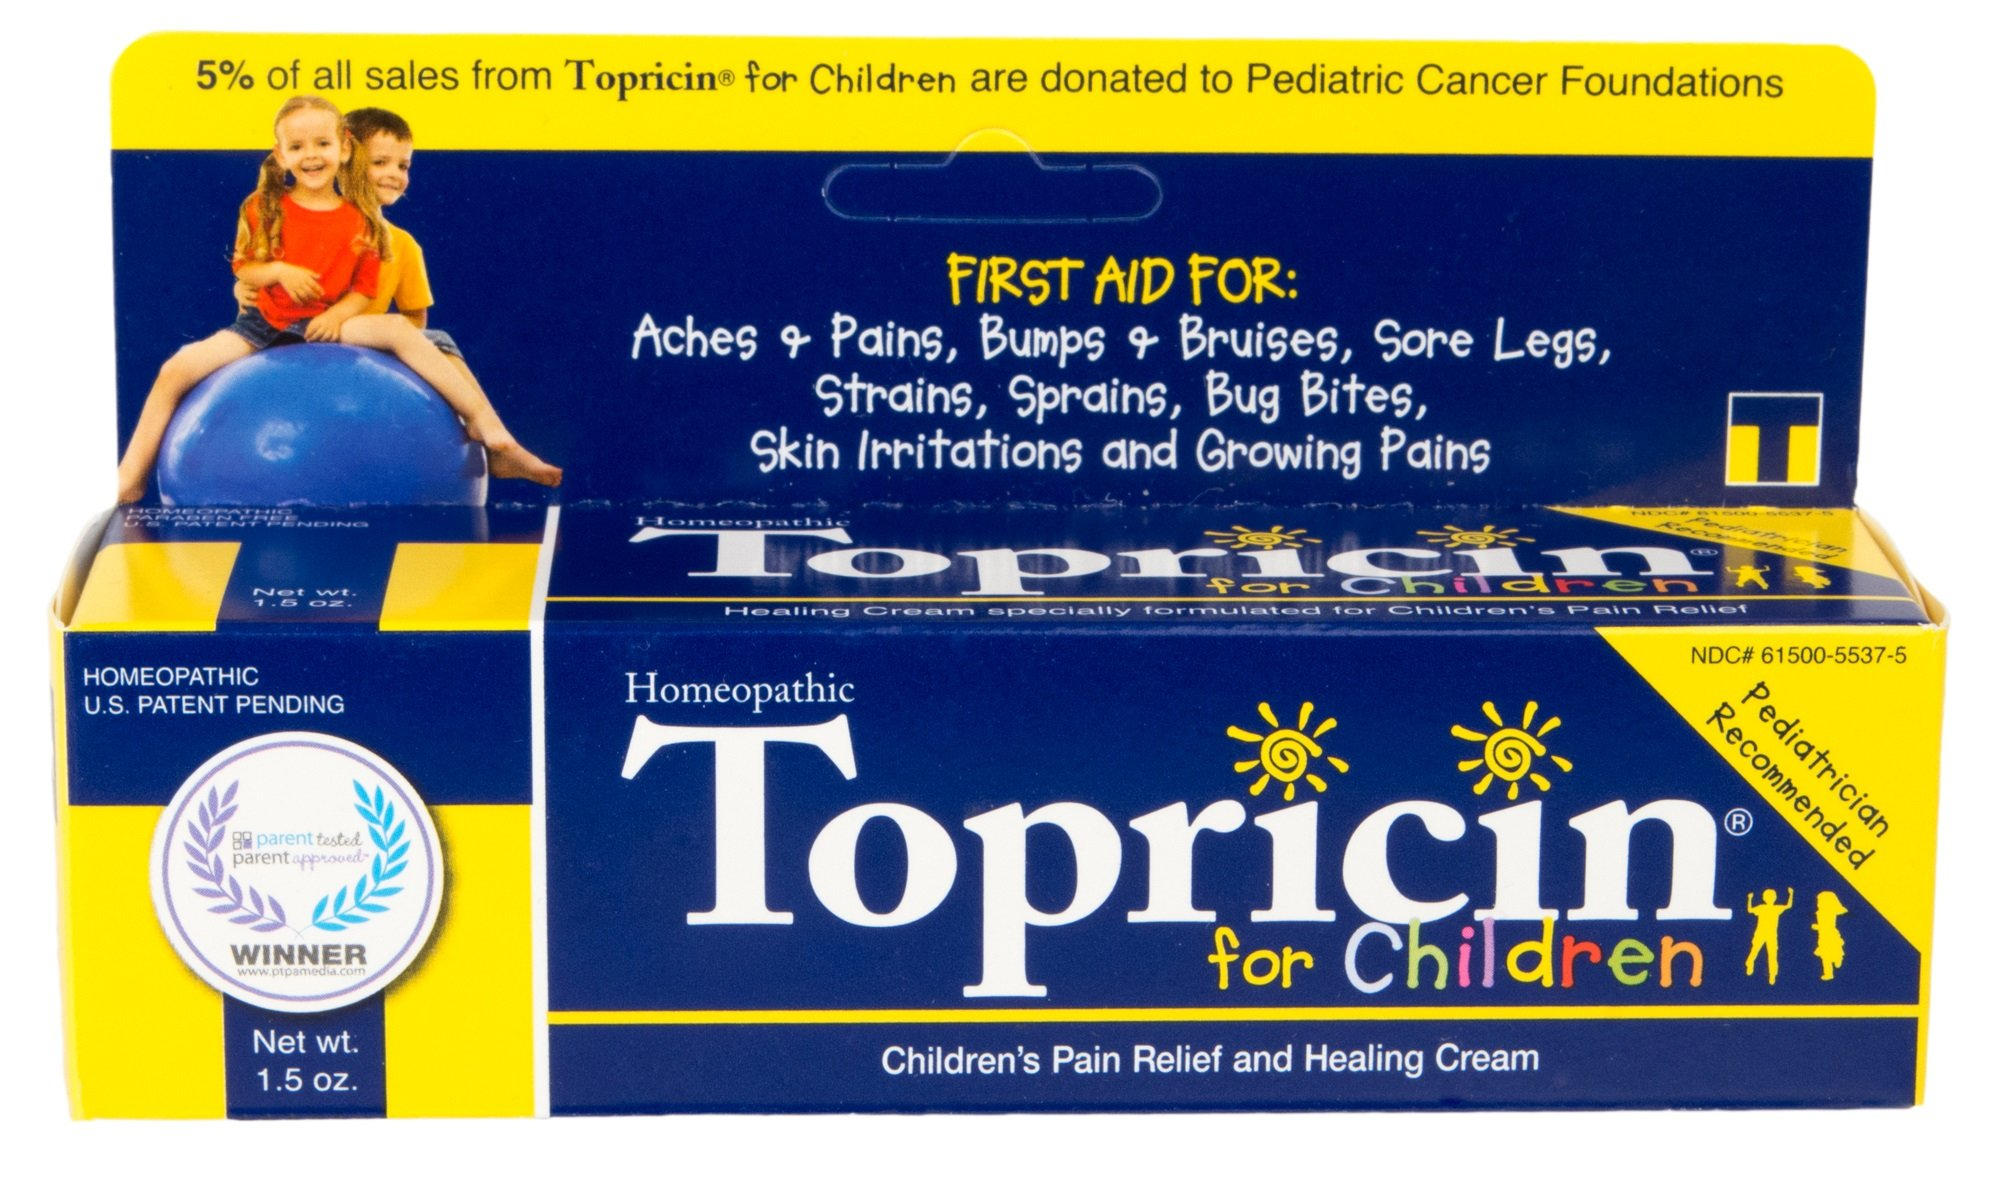 Topricin Children's Pain Relief and Healing Cream 1.5 oz